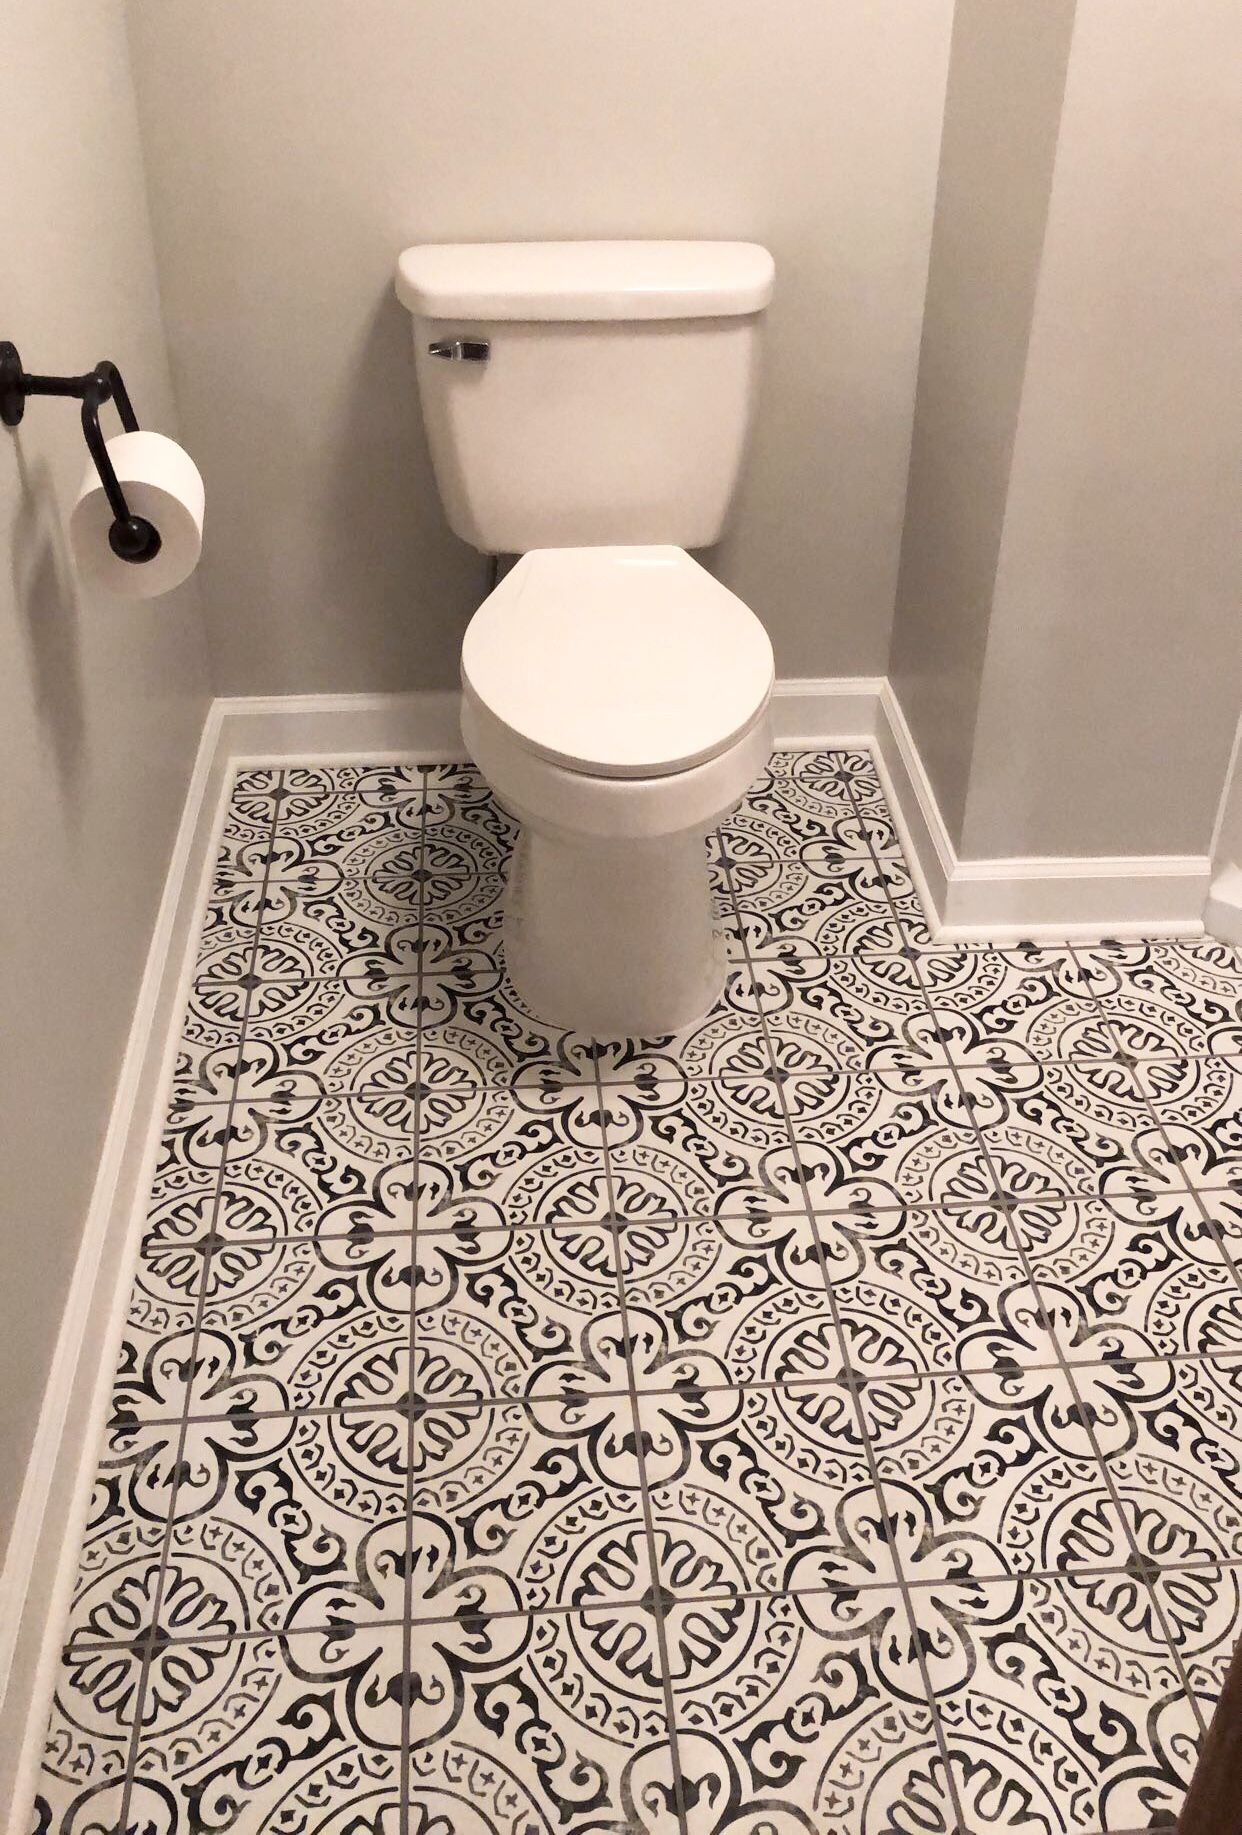 Paloma Porcelain Tile Flooring Small Bathroom Makeover Patterned Bathroom Tiles